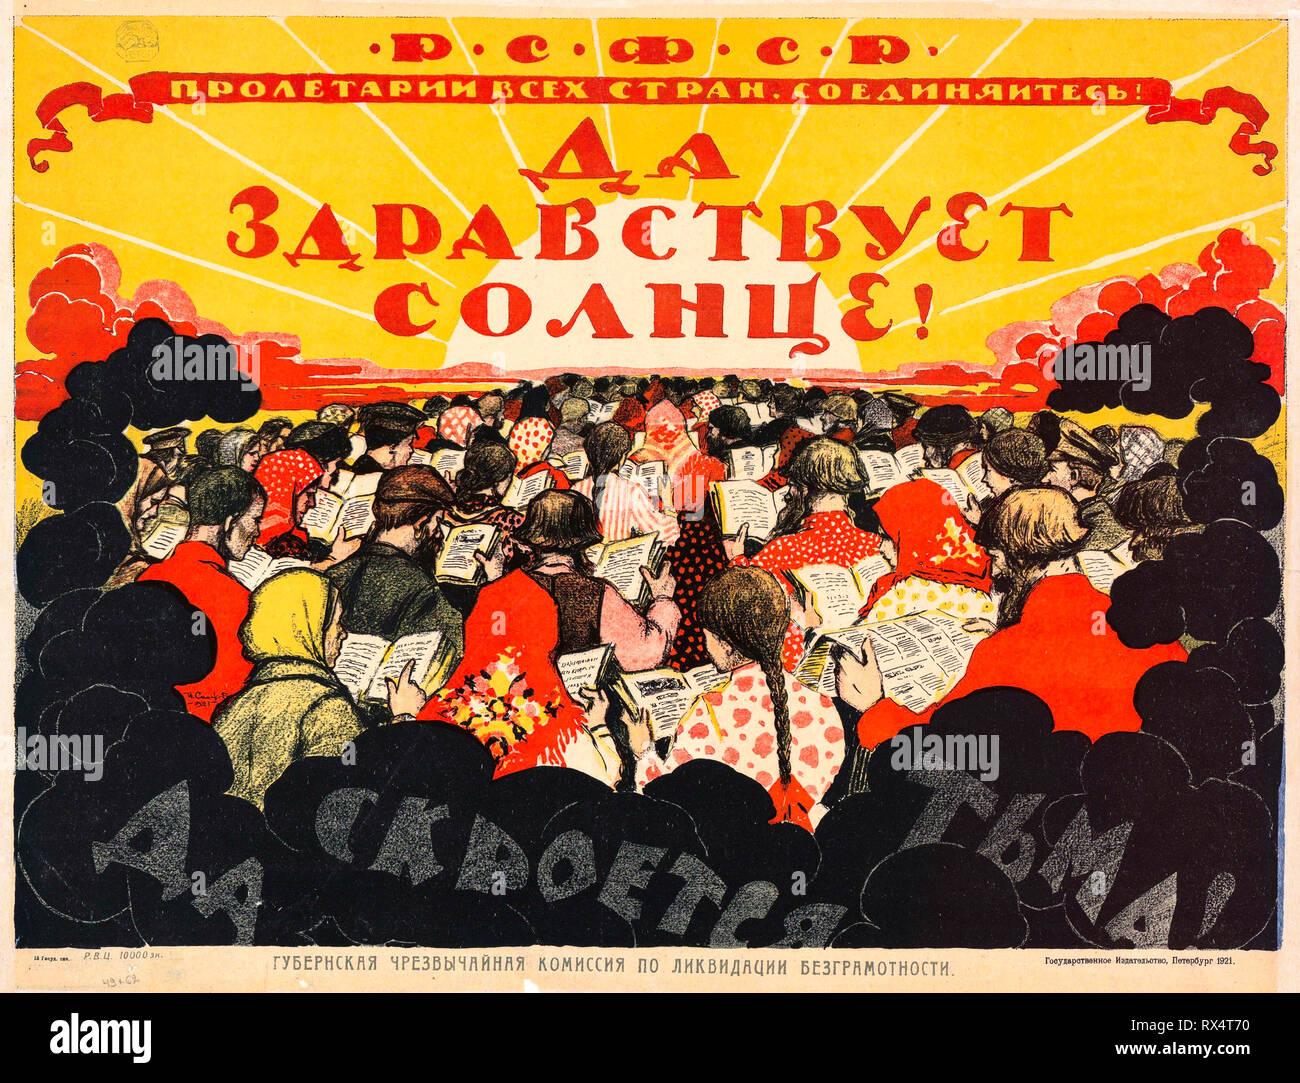 Soviet propaganda poster, Education and literacy, 1921 - Stock Image